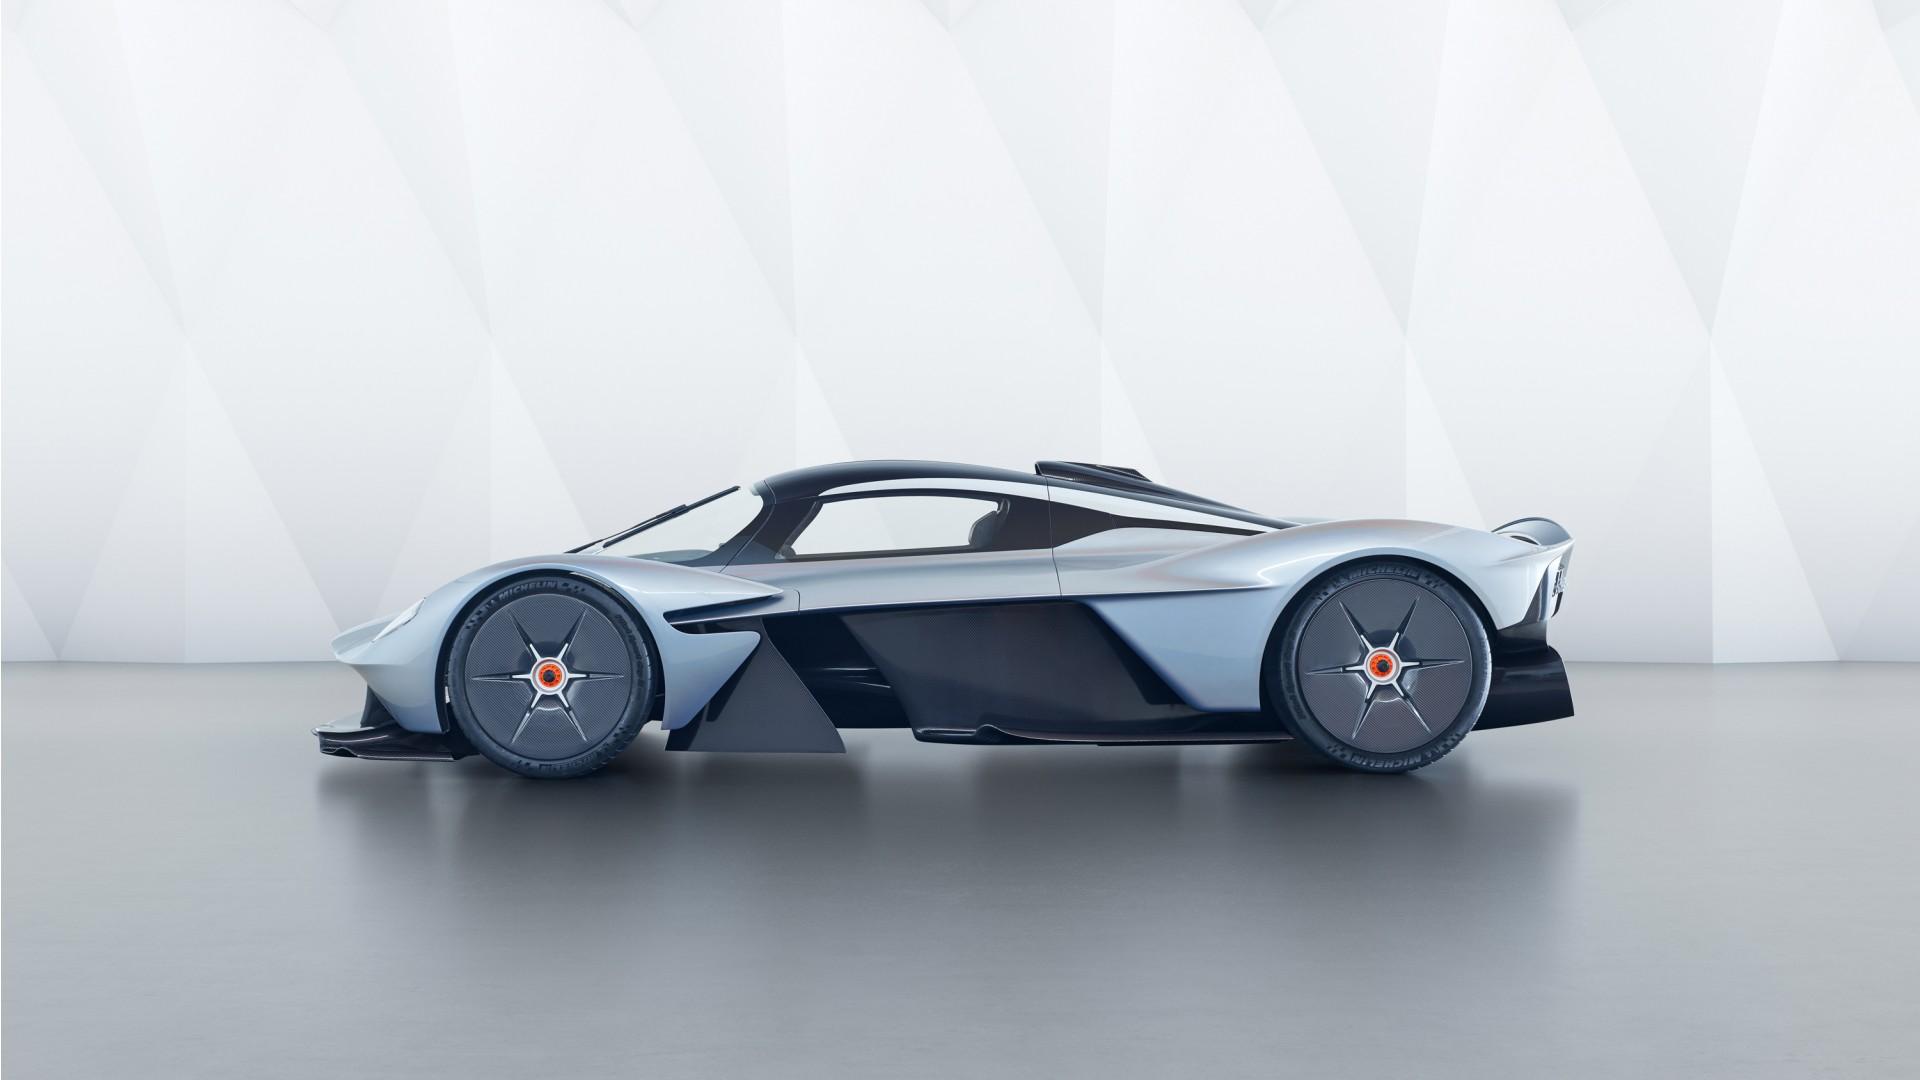 2018 Aston Martin Valkyrie 3 Wallpaper | HD Car Wallpapers ...